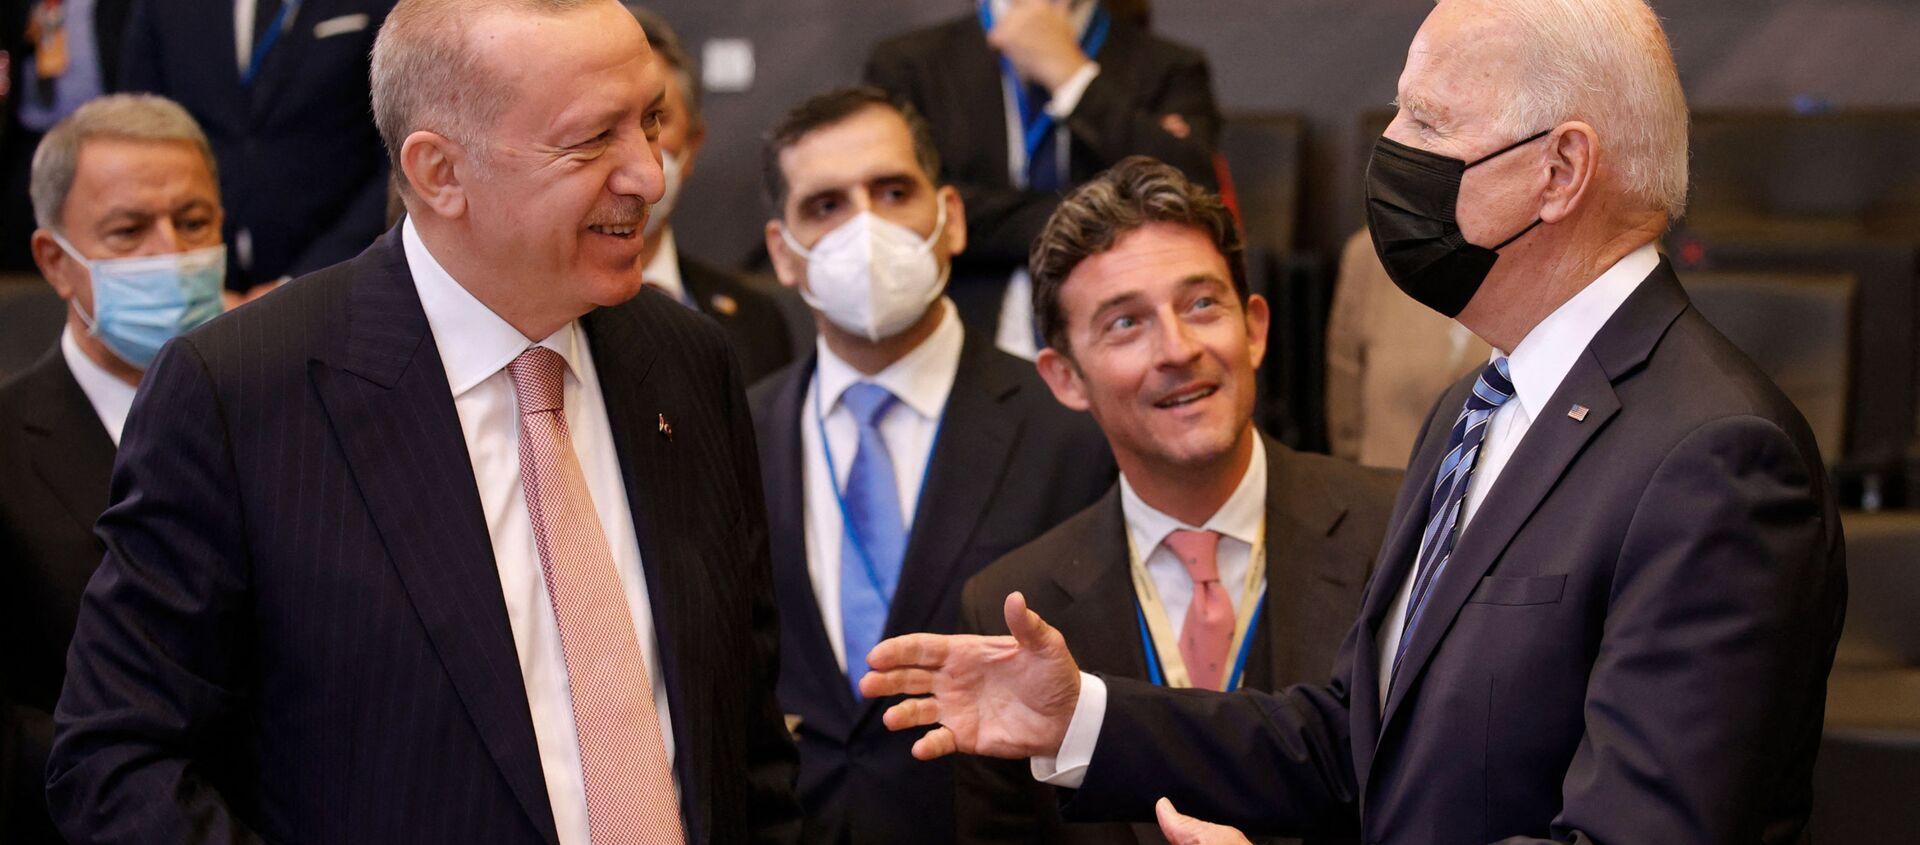 Rencontre d'Erdogan et Biden - Sputnik France, 1920, 01.09.2021